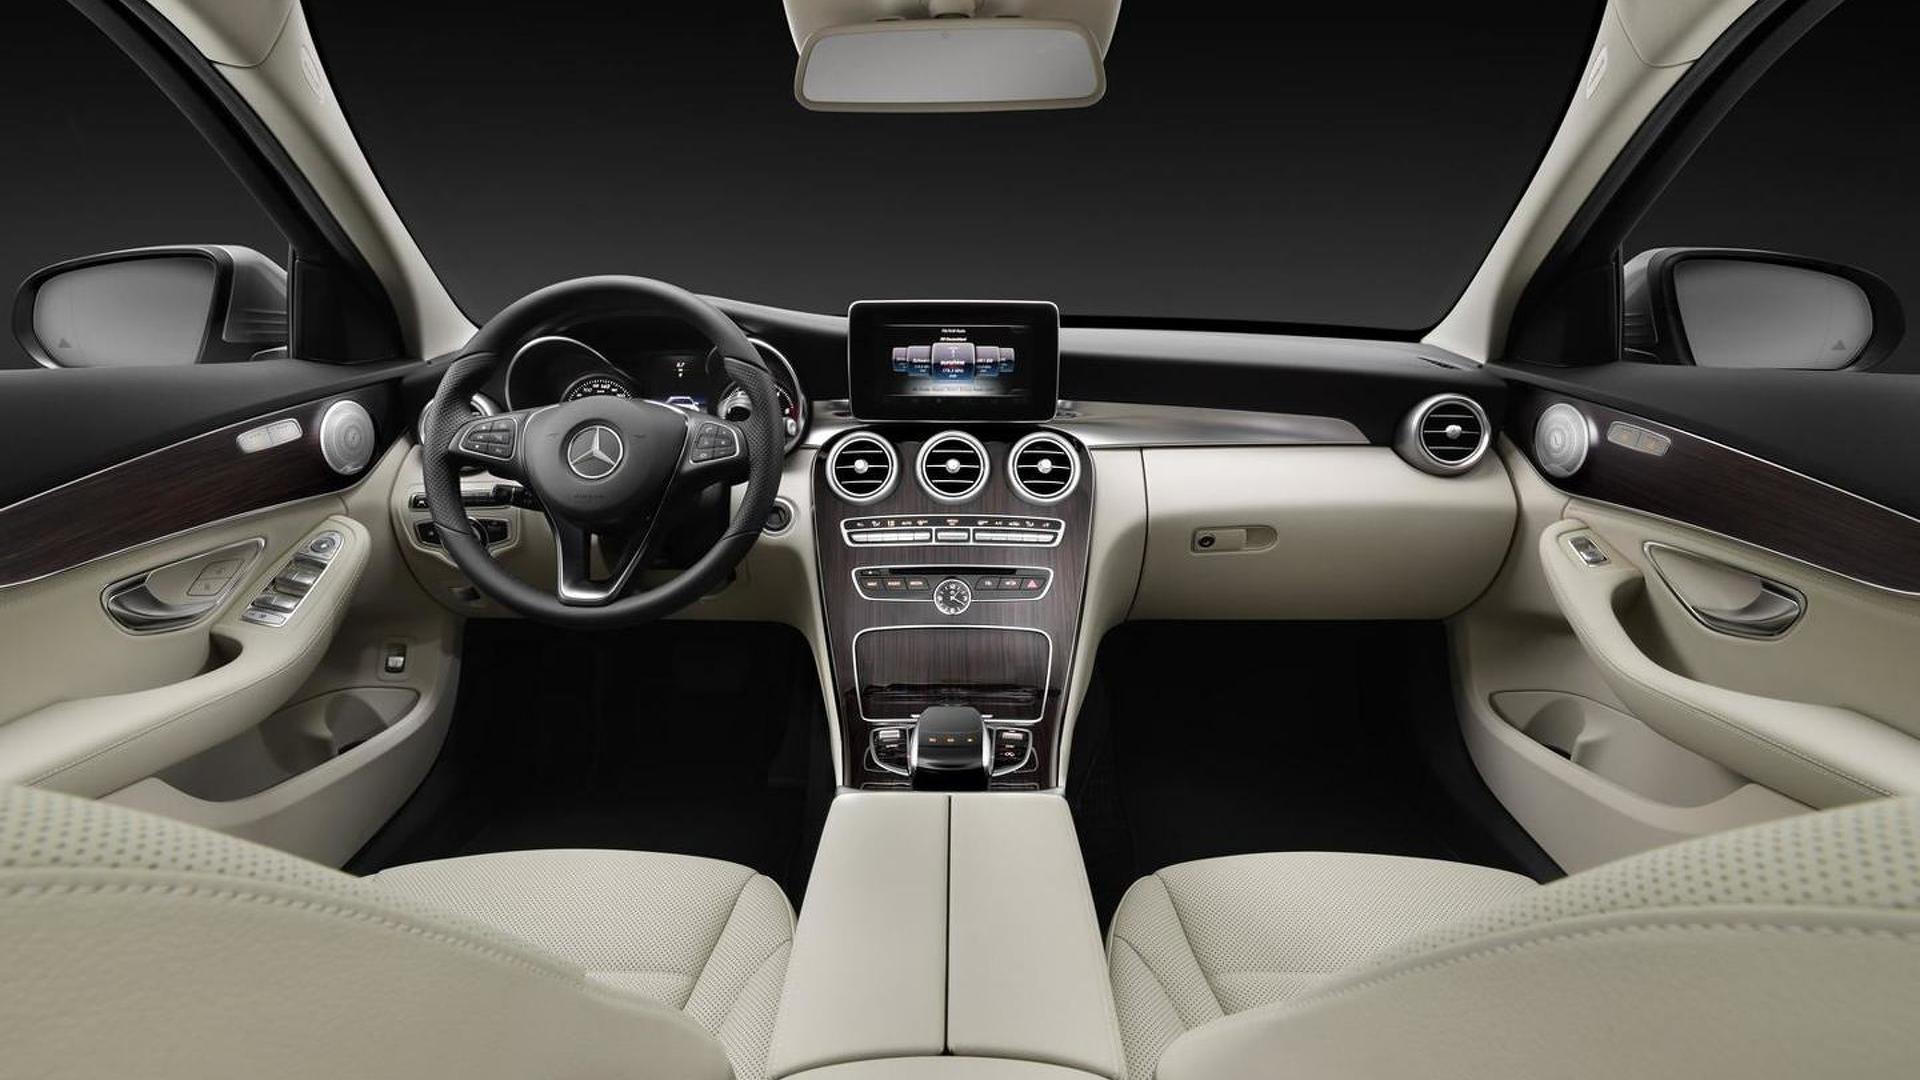 review class express c mercedes auto coupe benz